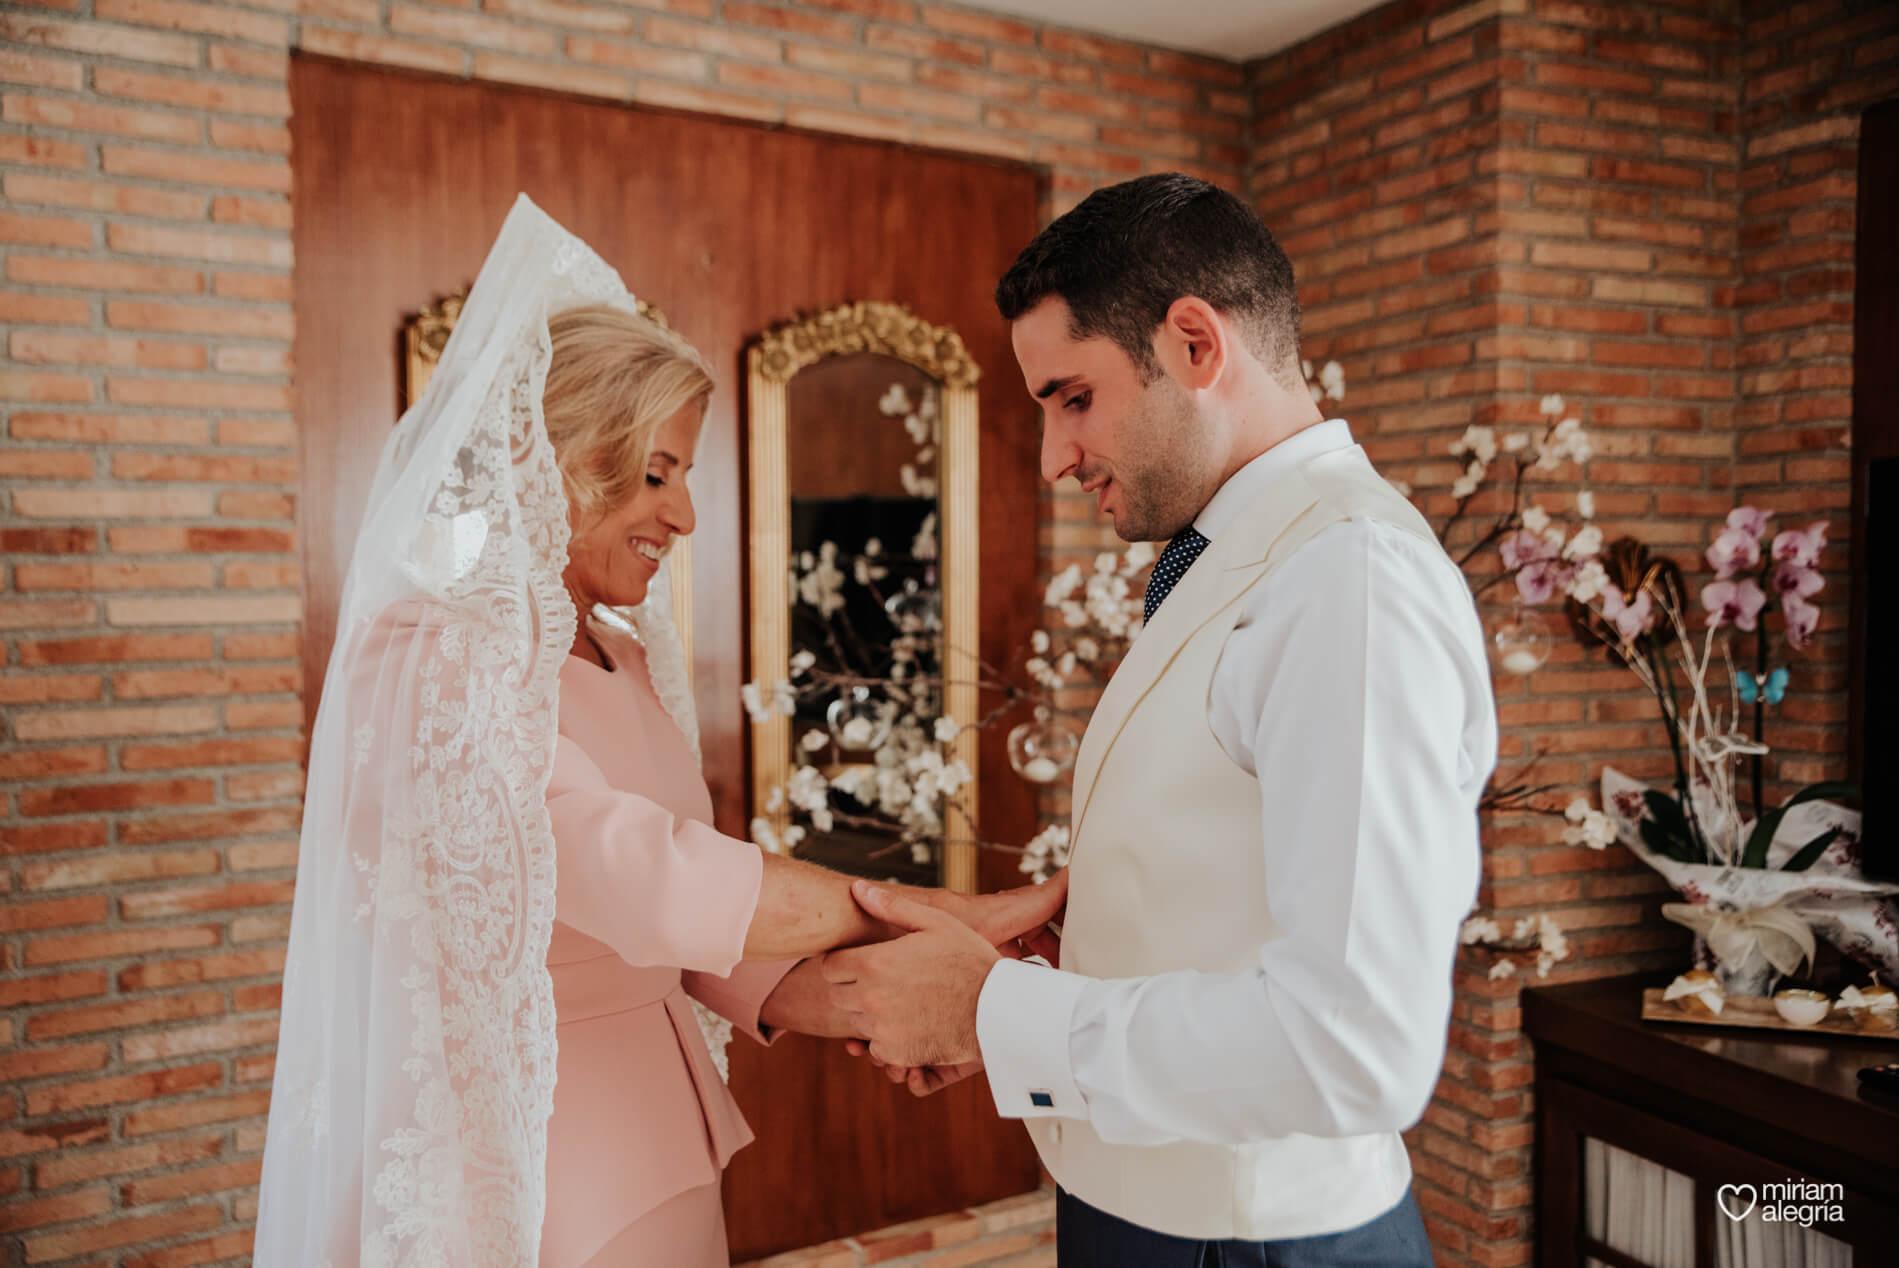 boda-en-almeria-miriam-alegria-23